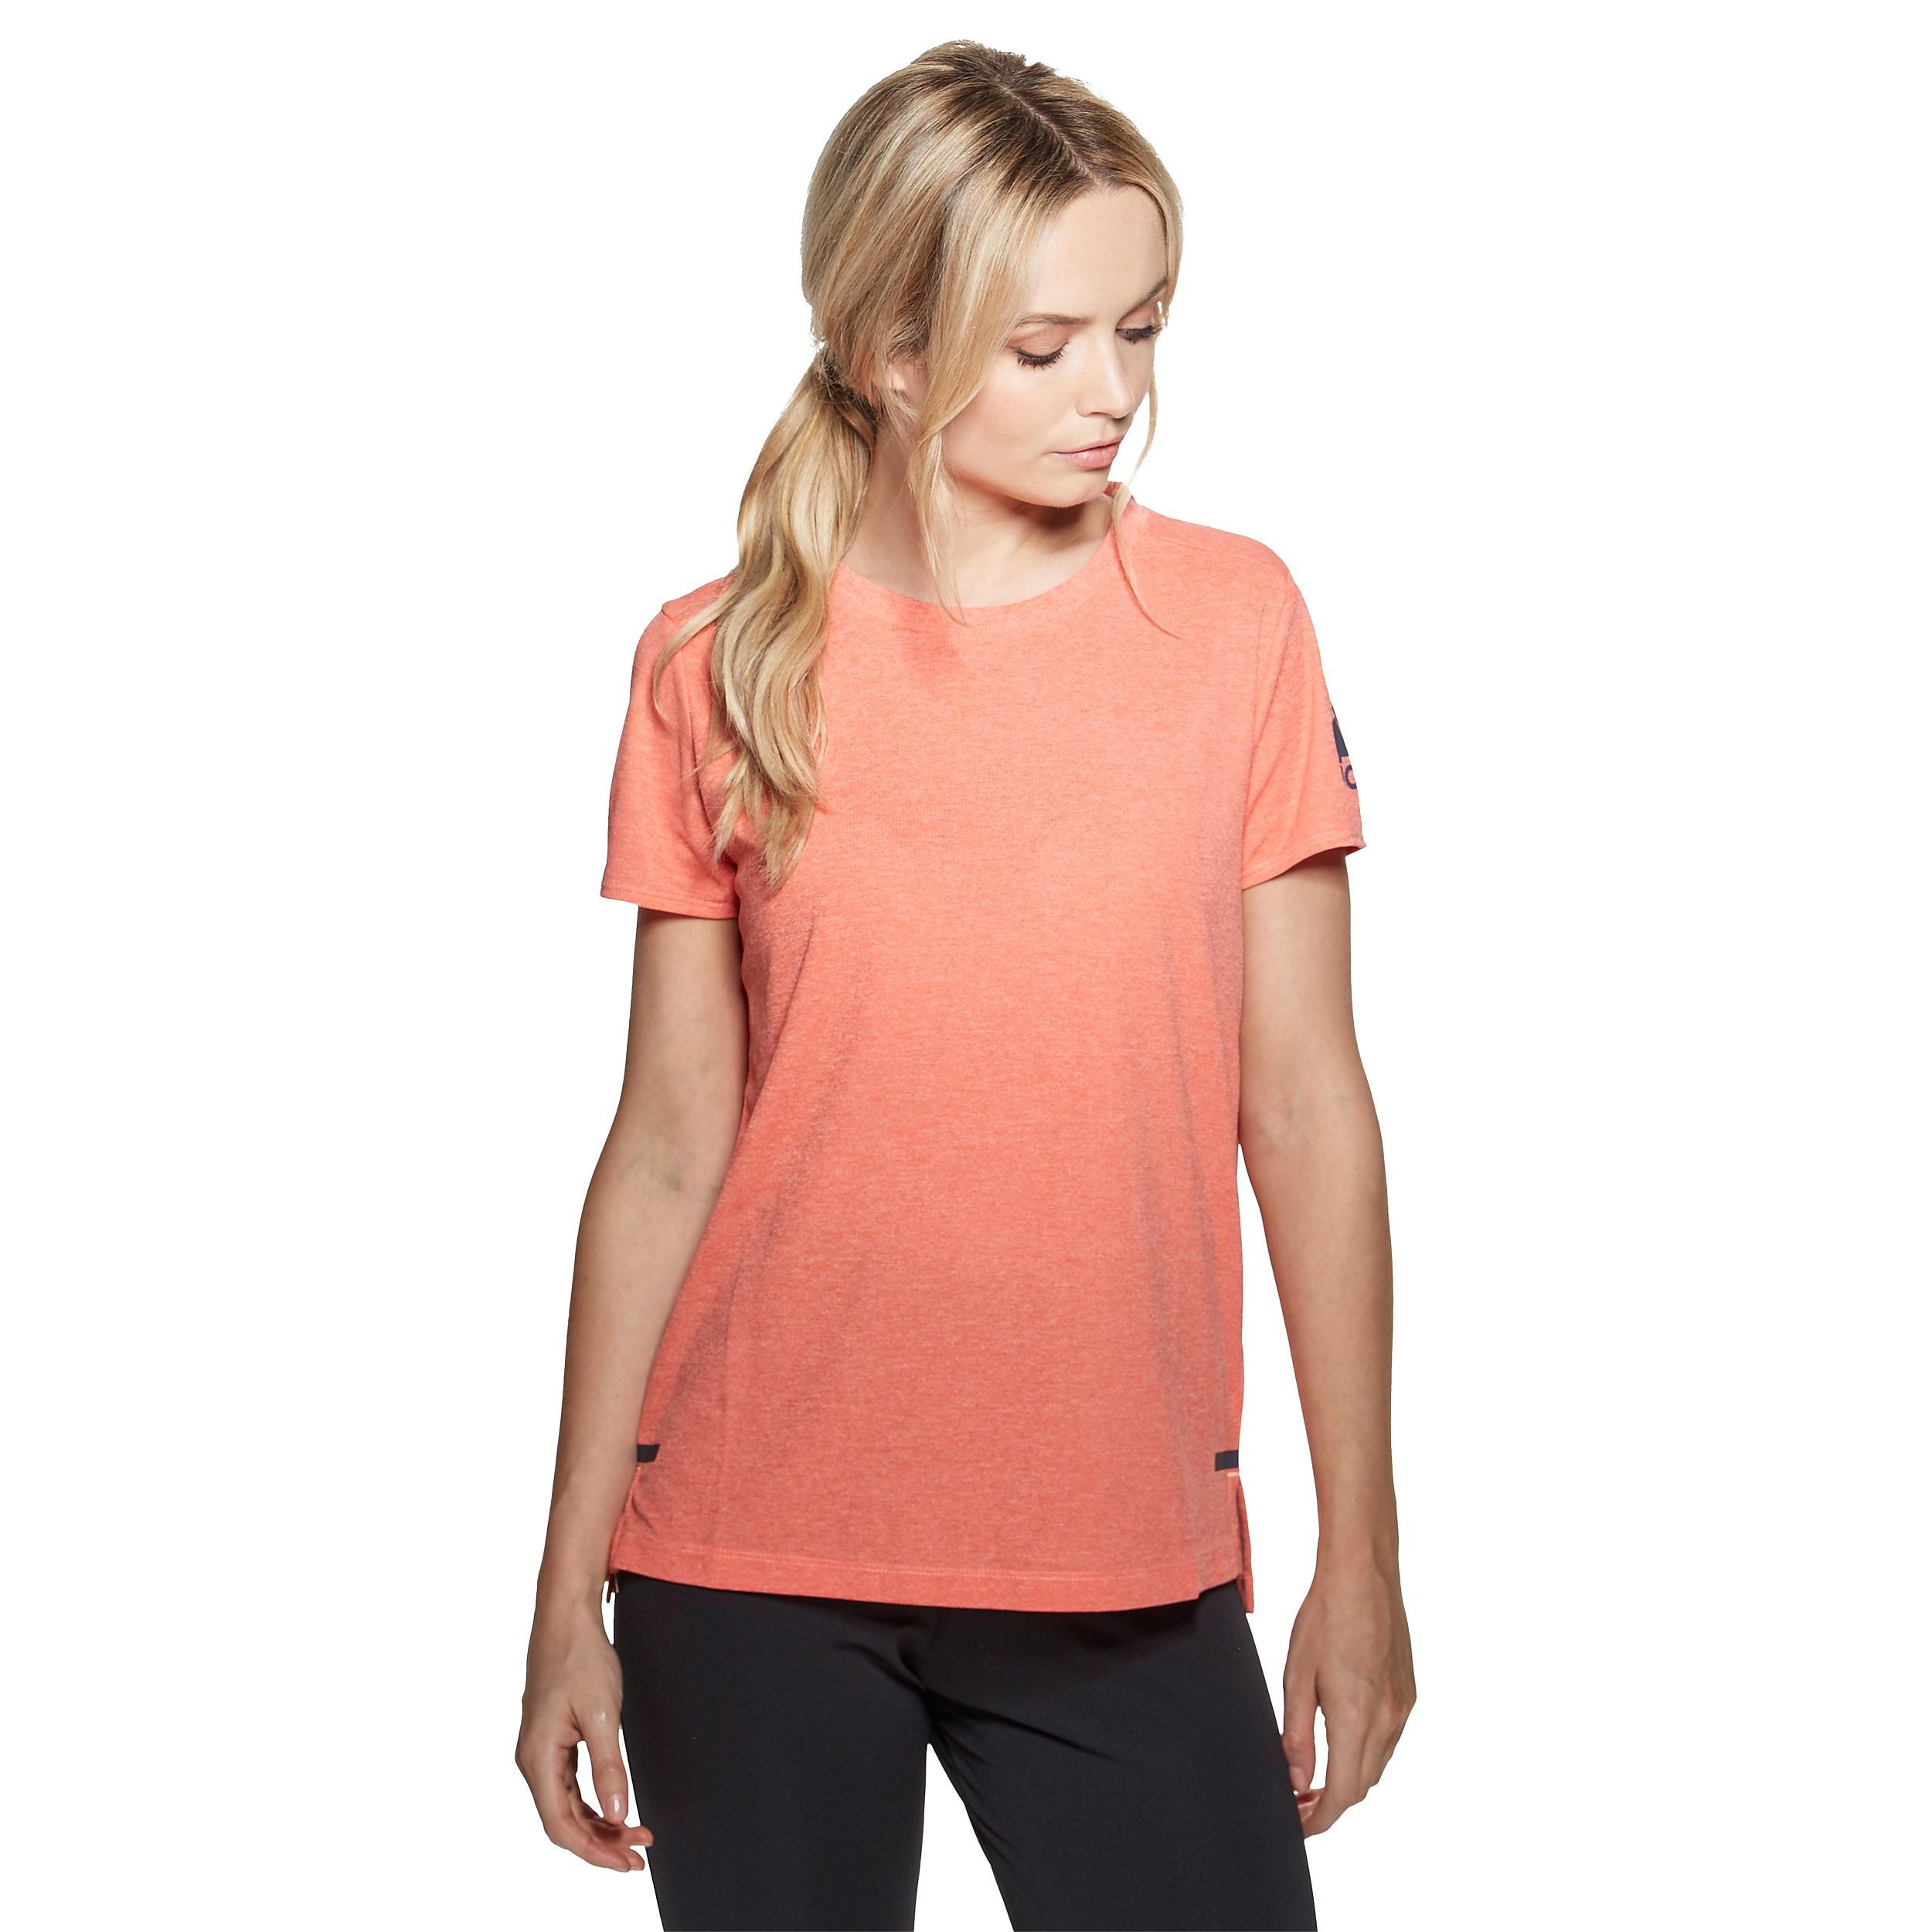 adidas Climachill Women's Training T-Shirt